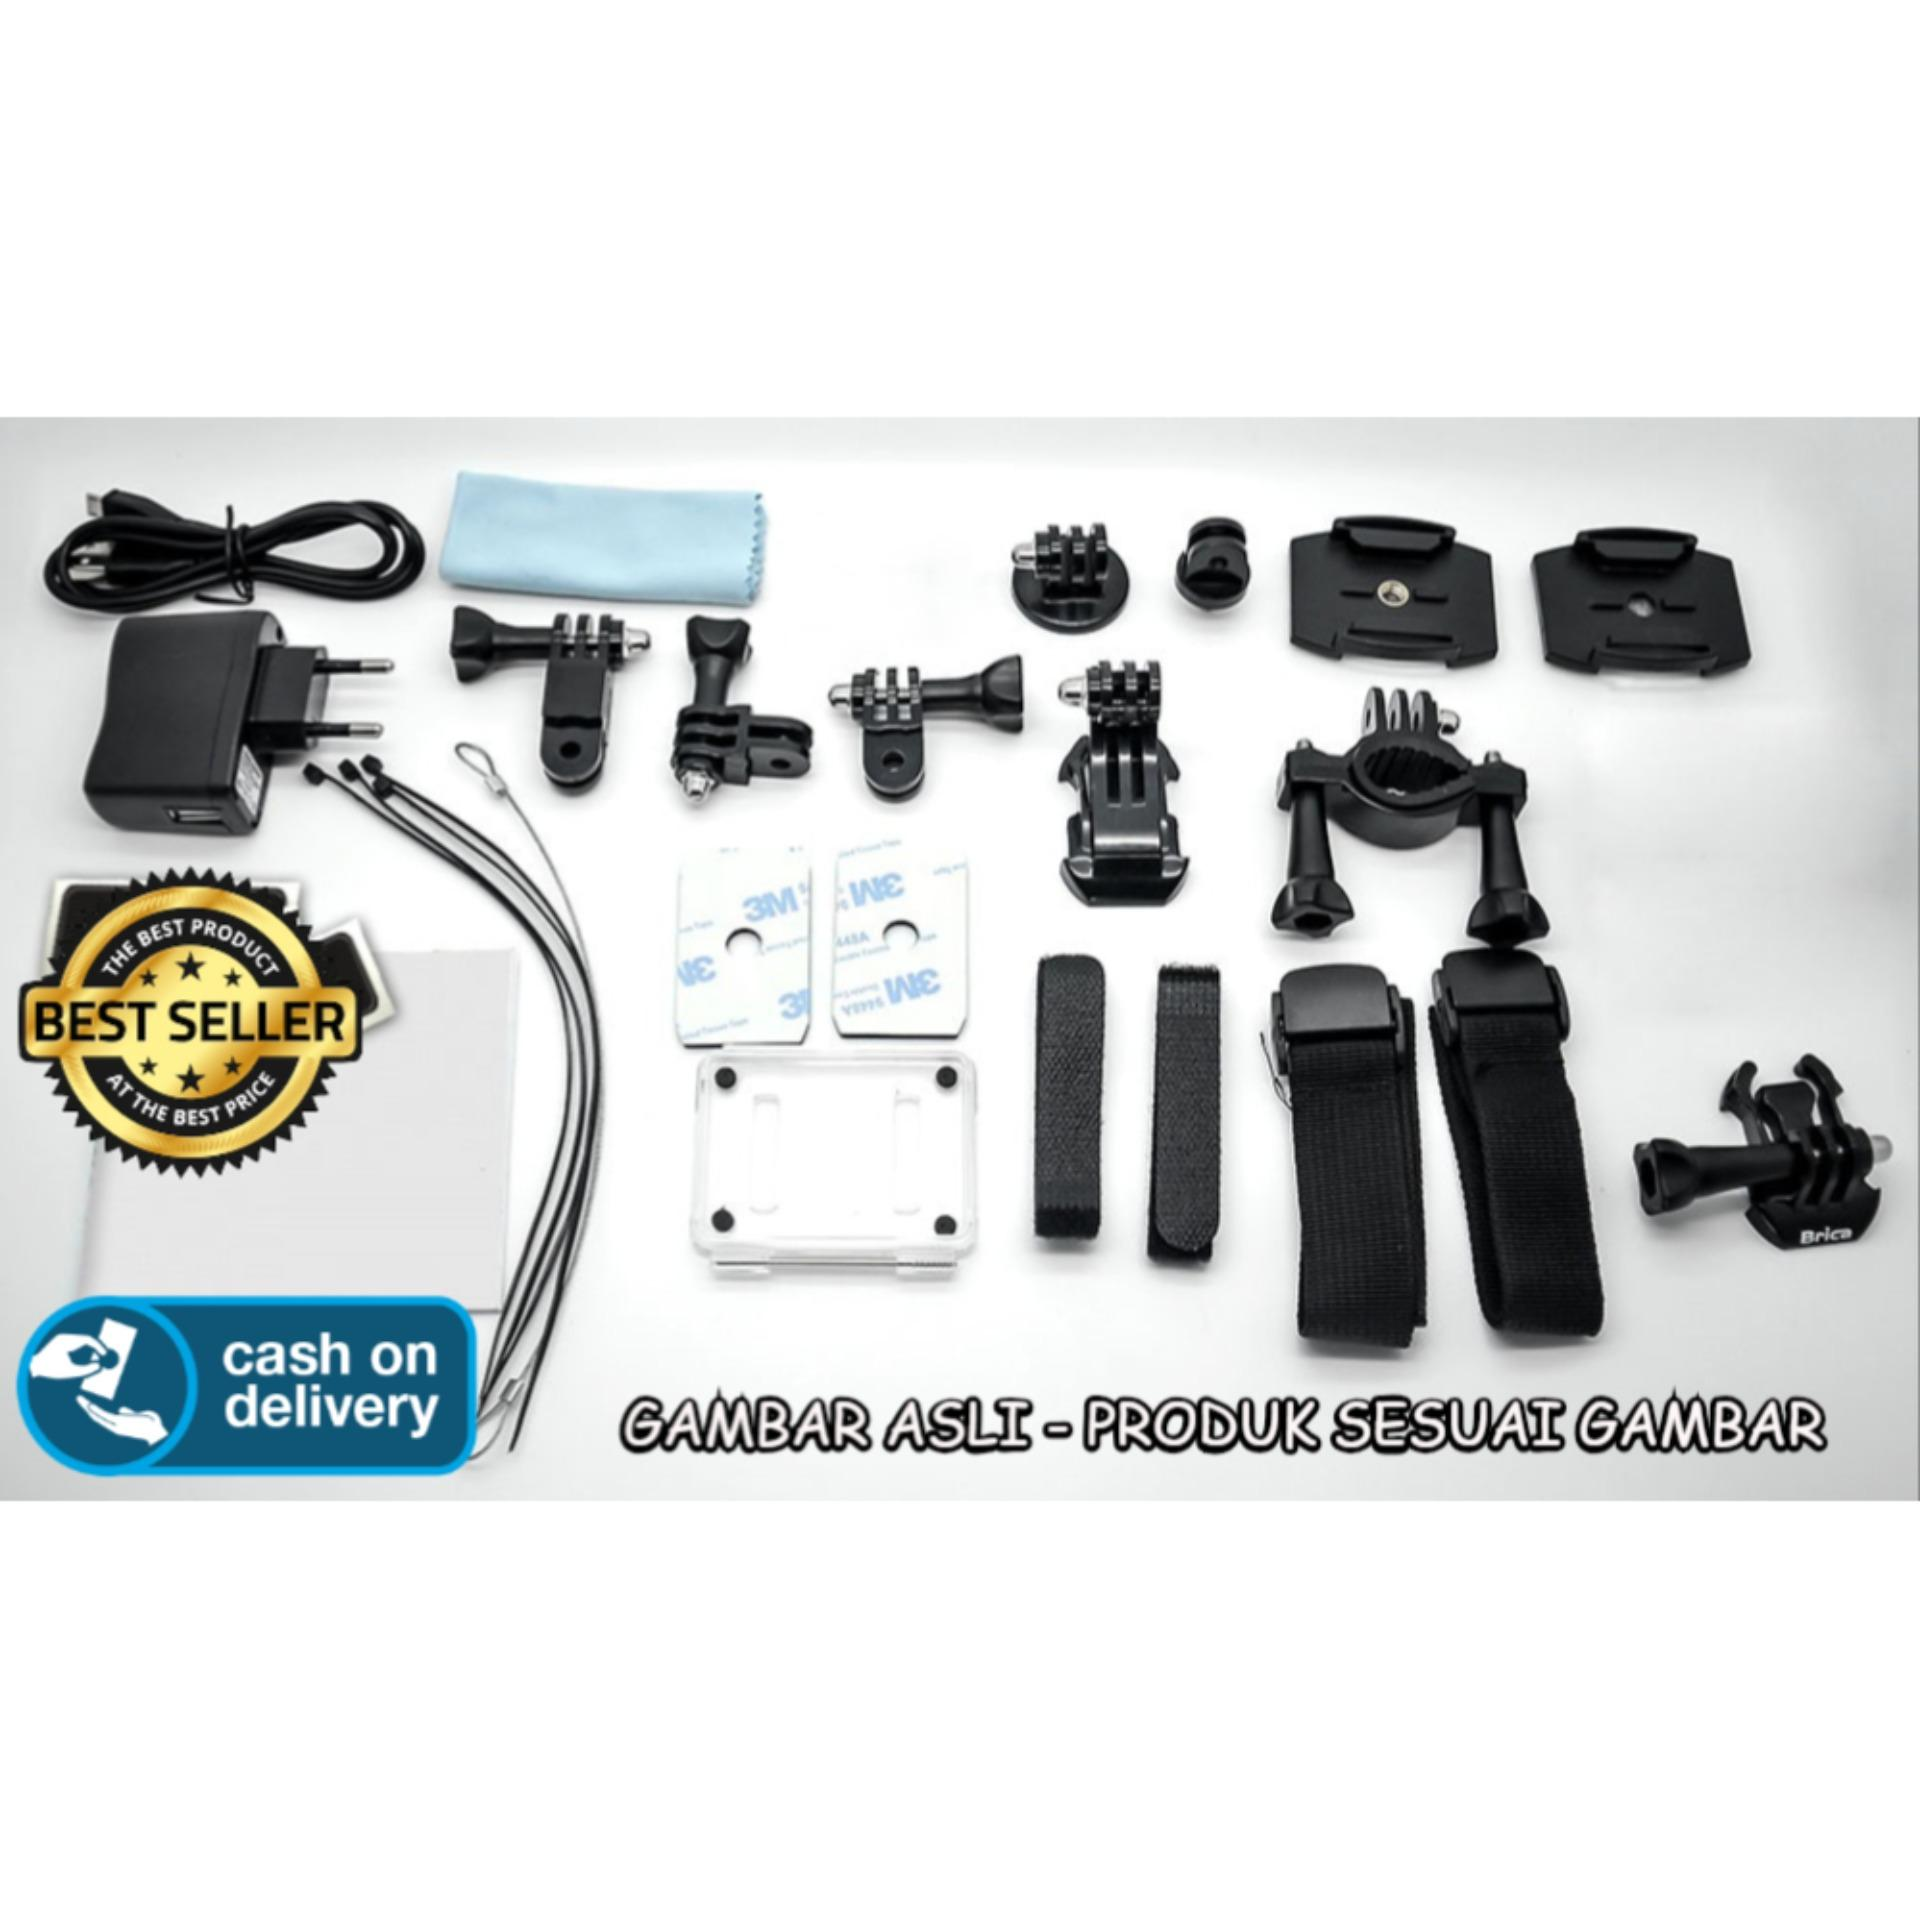 Fitur Big Store Acc Sports Cam Action Wifi Non Ultra Hd 4k Camera Sportcam Gopro